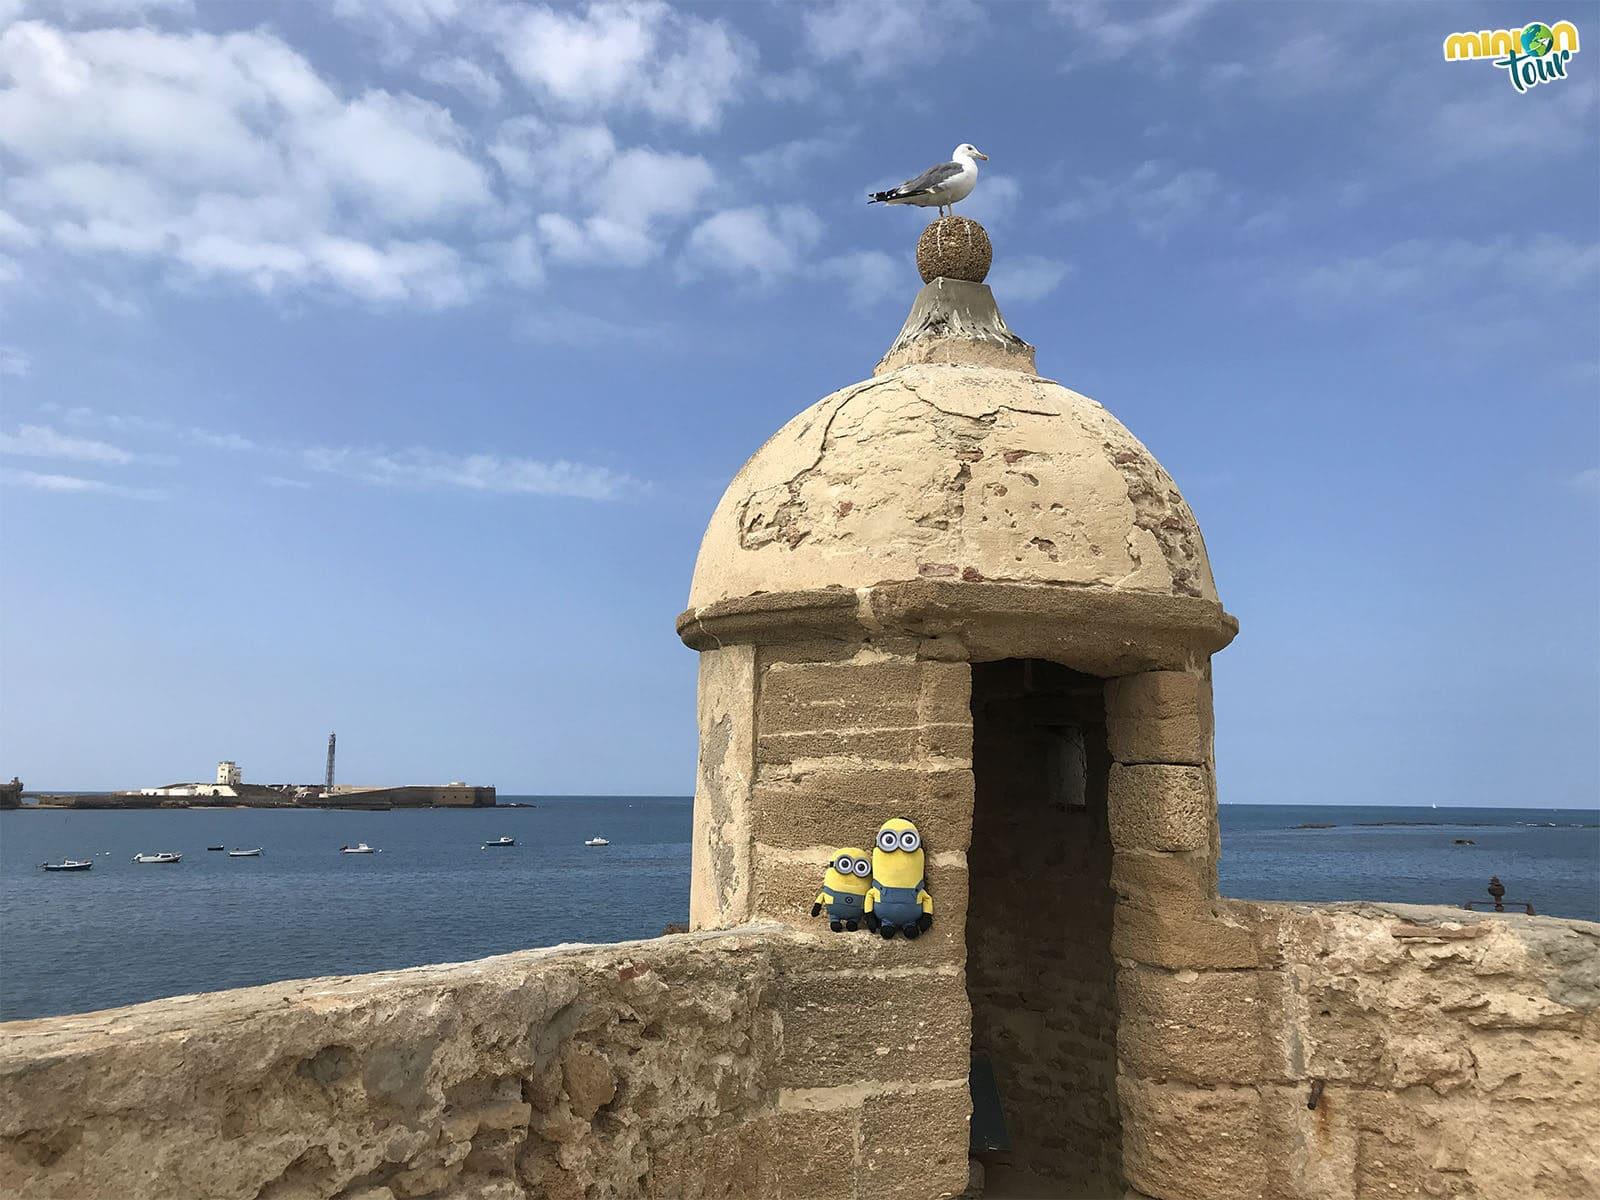 MiniOnTour en el Castillo de Santa Catalina en Cádiz